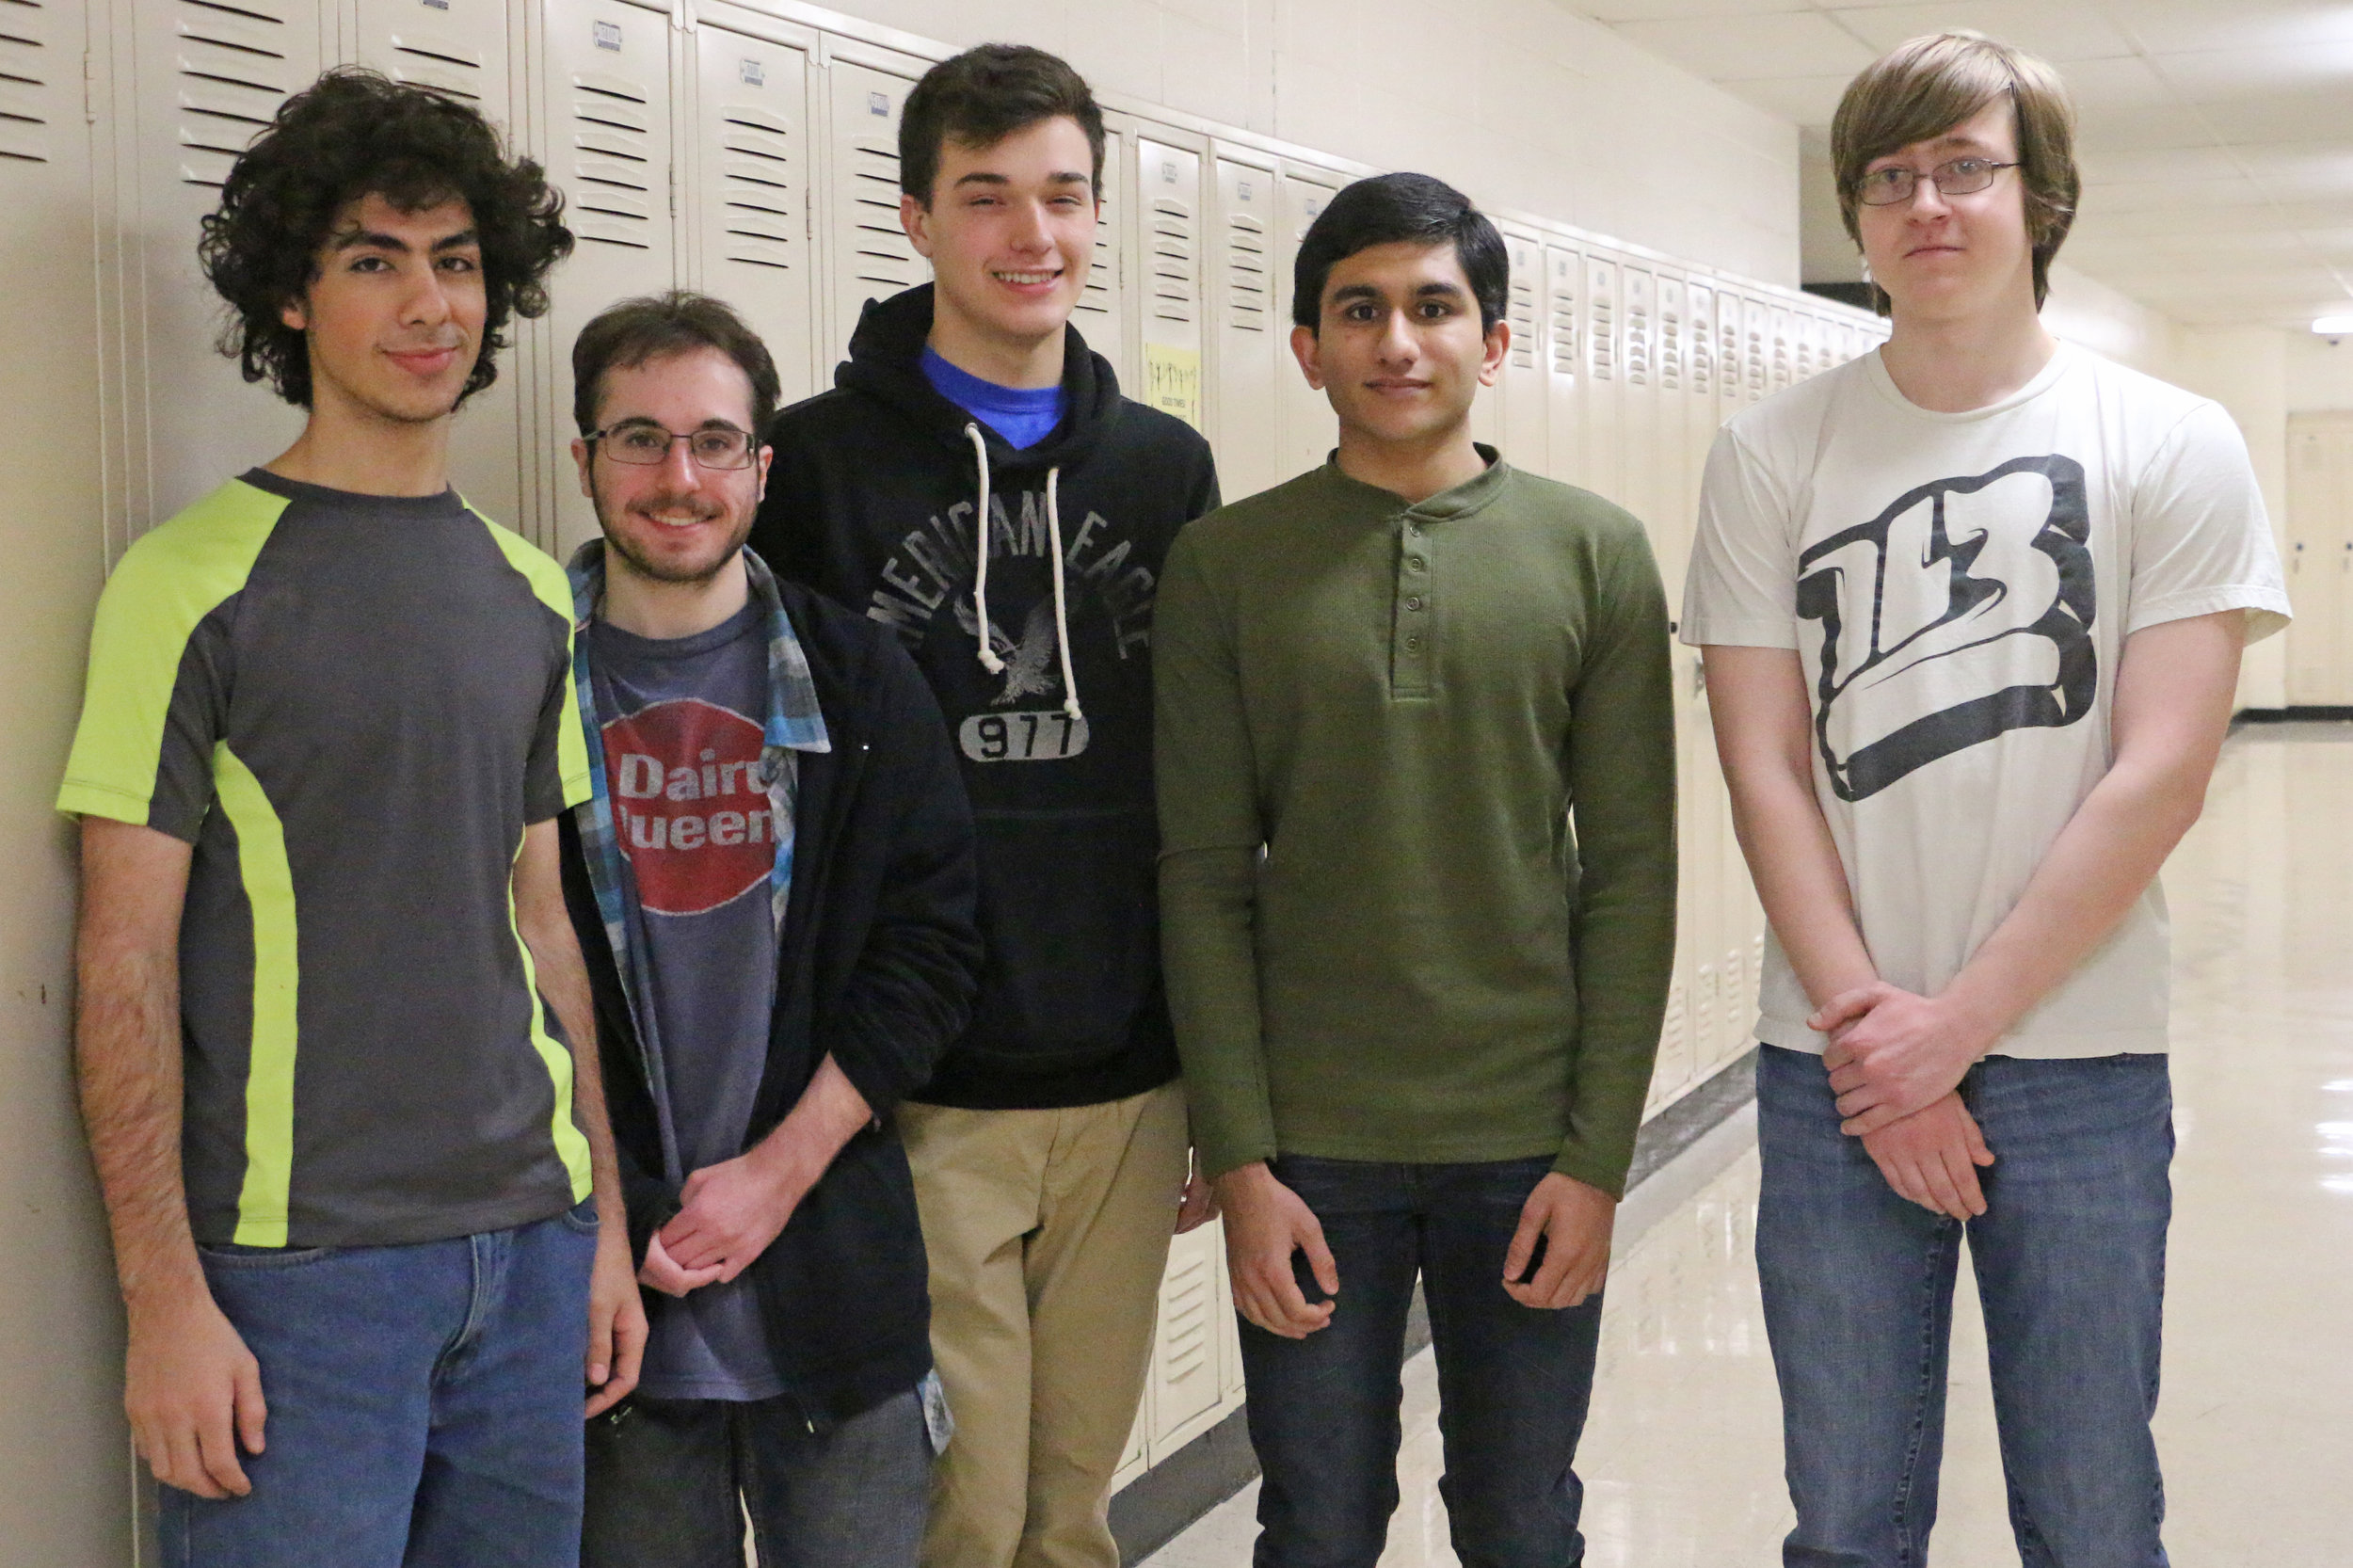 Hersey students Yousef Awmrin, John Labuda, Luke Allen, Mark Thomas and Patrick Piatek were named the third best team in Illinois's CyberPatriot IX State Round.